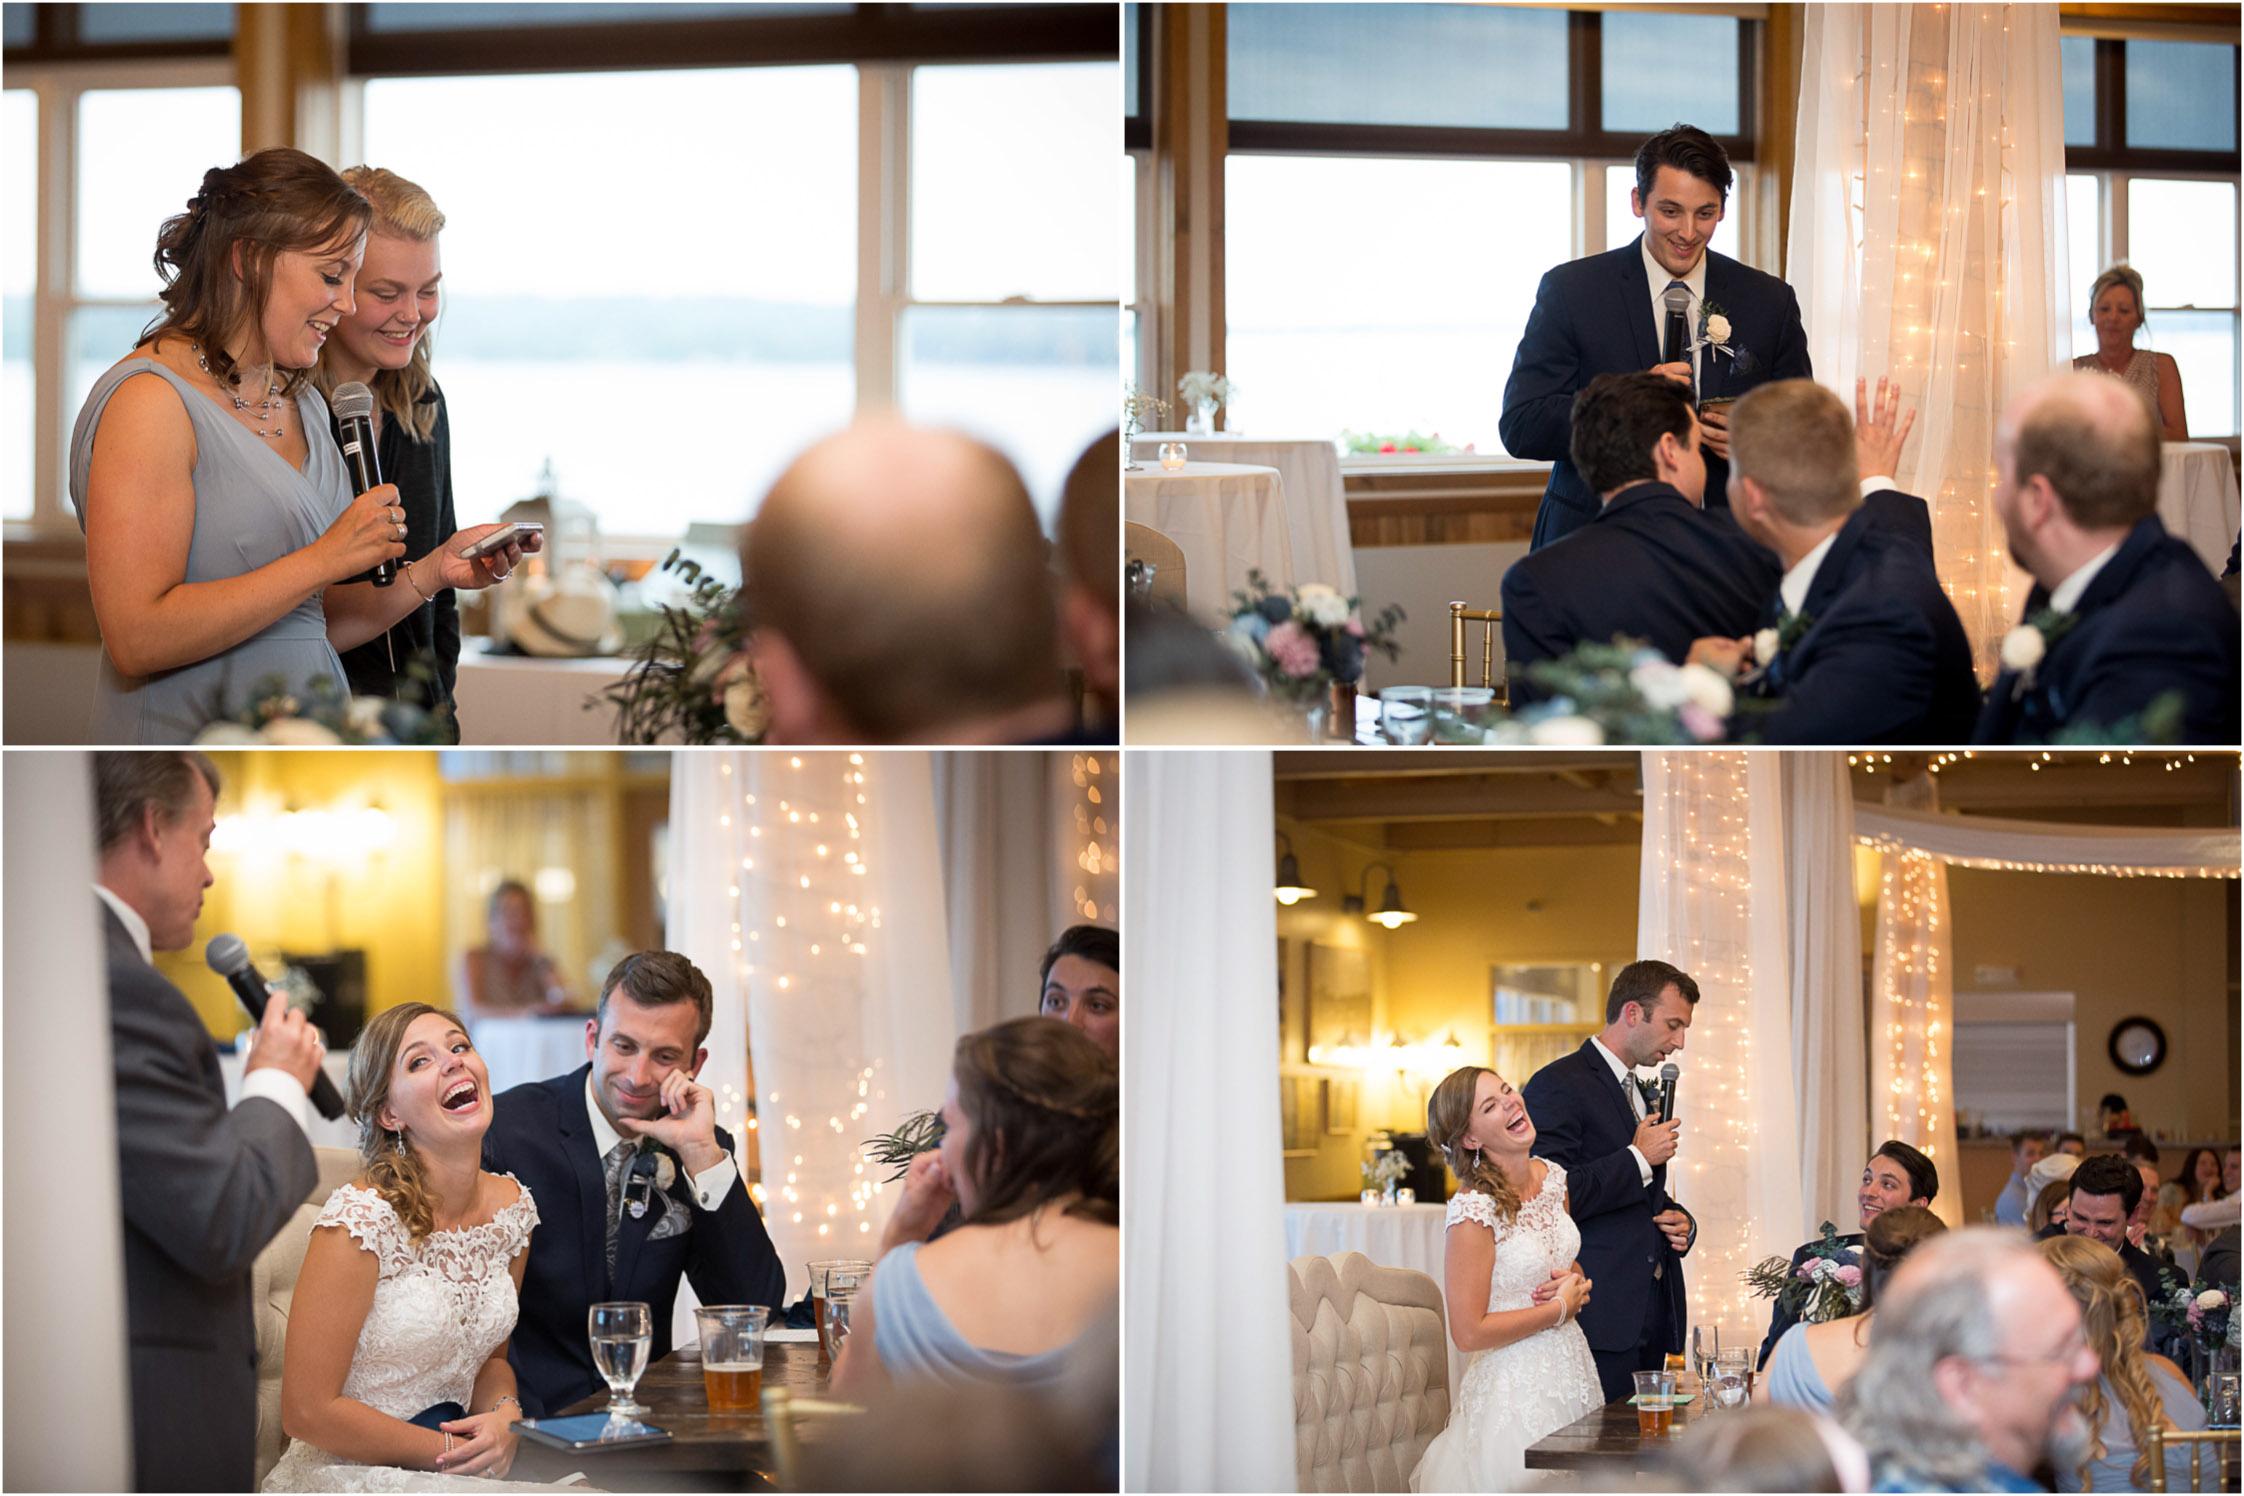 19-northern-minnesota-summer-lake-wedding-reception-toasts-lakeside-chophouse-mahonen-photography.jpg